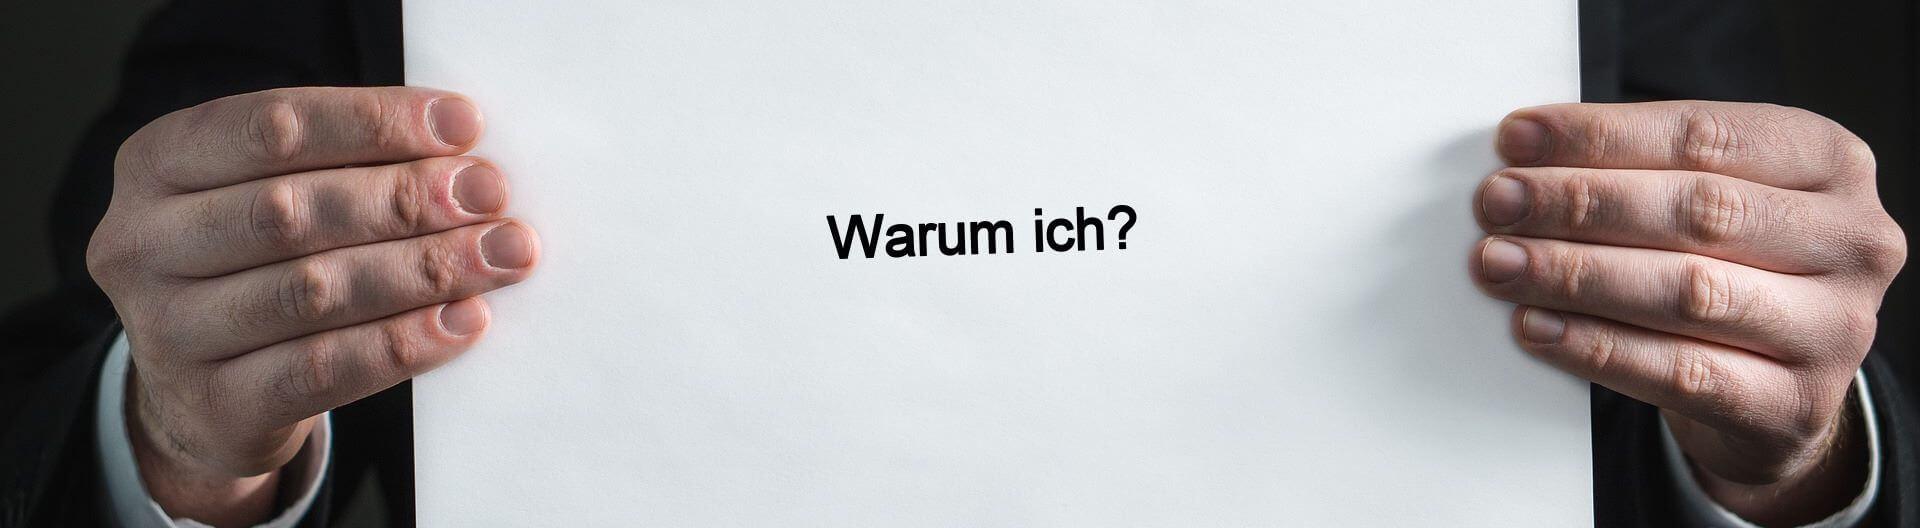 Webdesign_Hechthausen Homepage Website hemmoor wingst cadenberge dorum nordenham stade